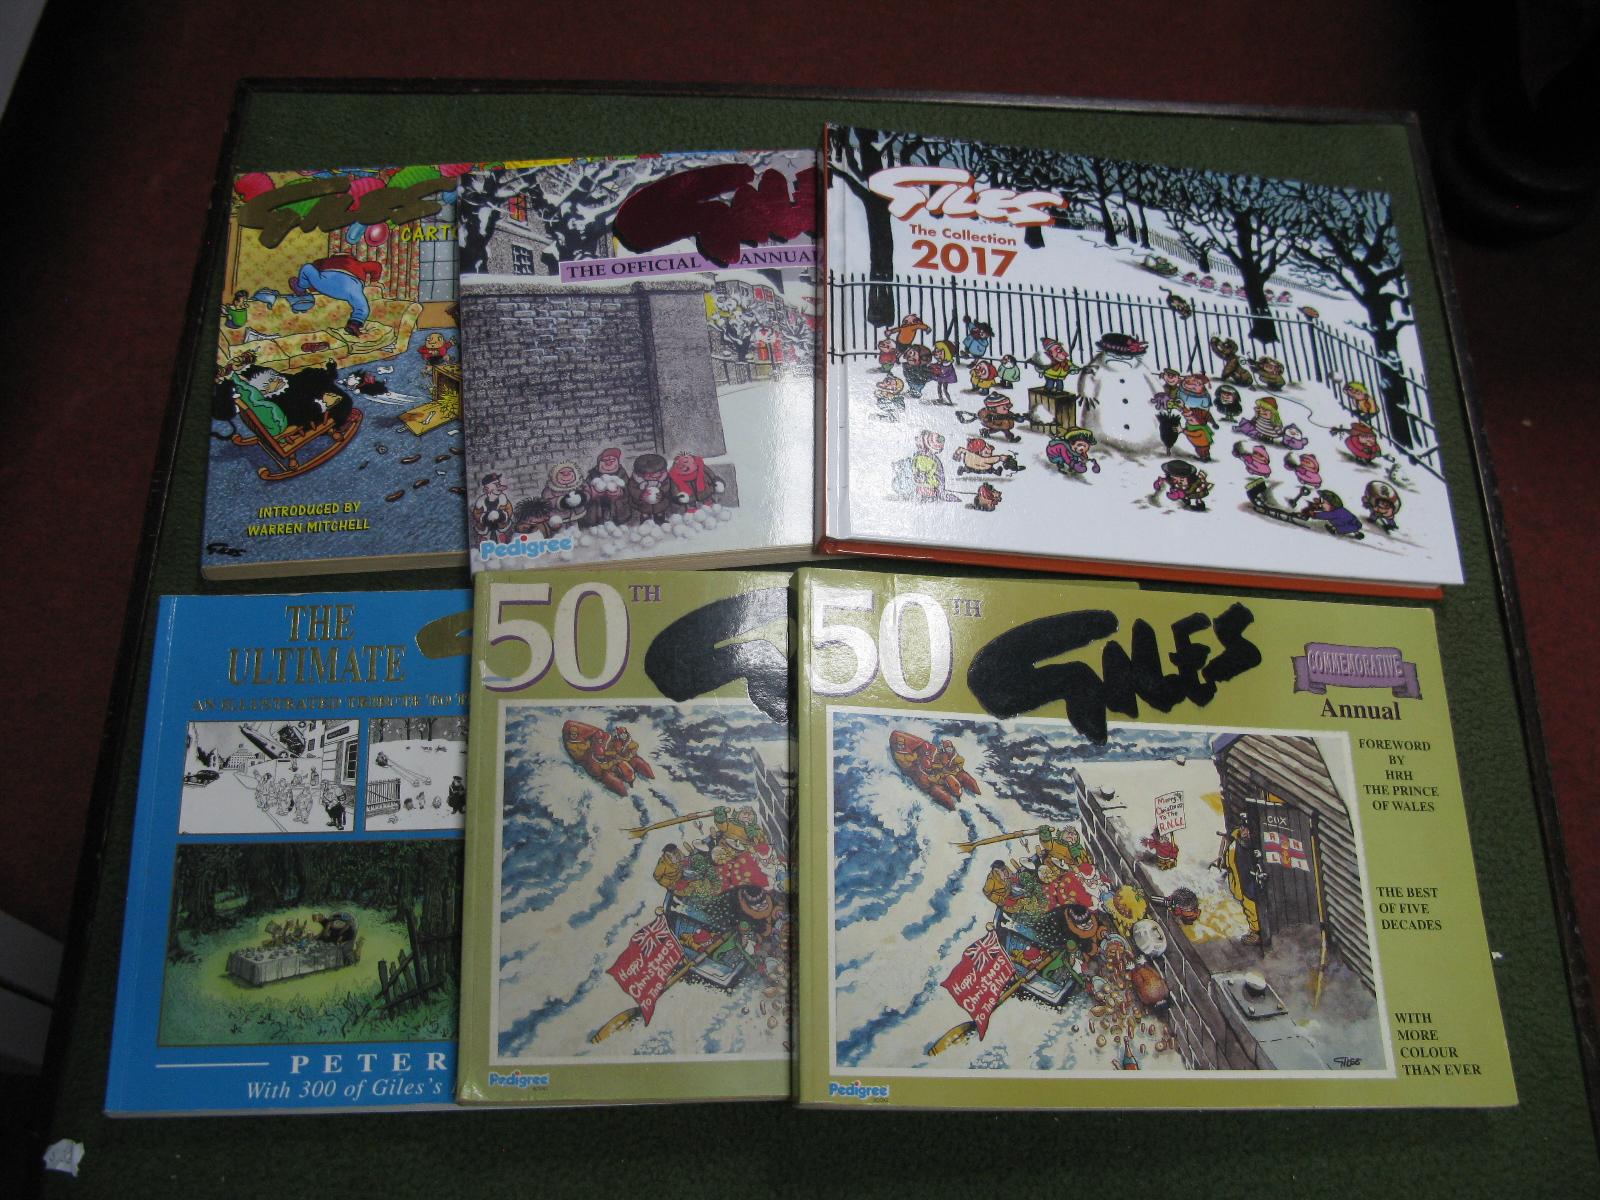 A Small Quantity of Giles Annuals.